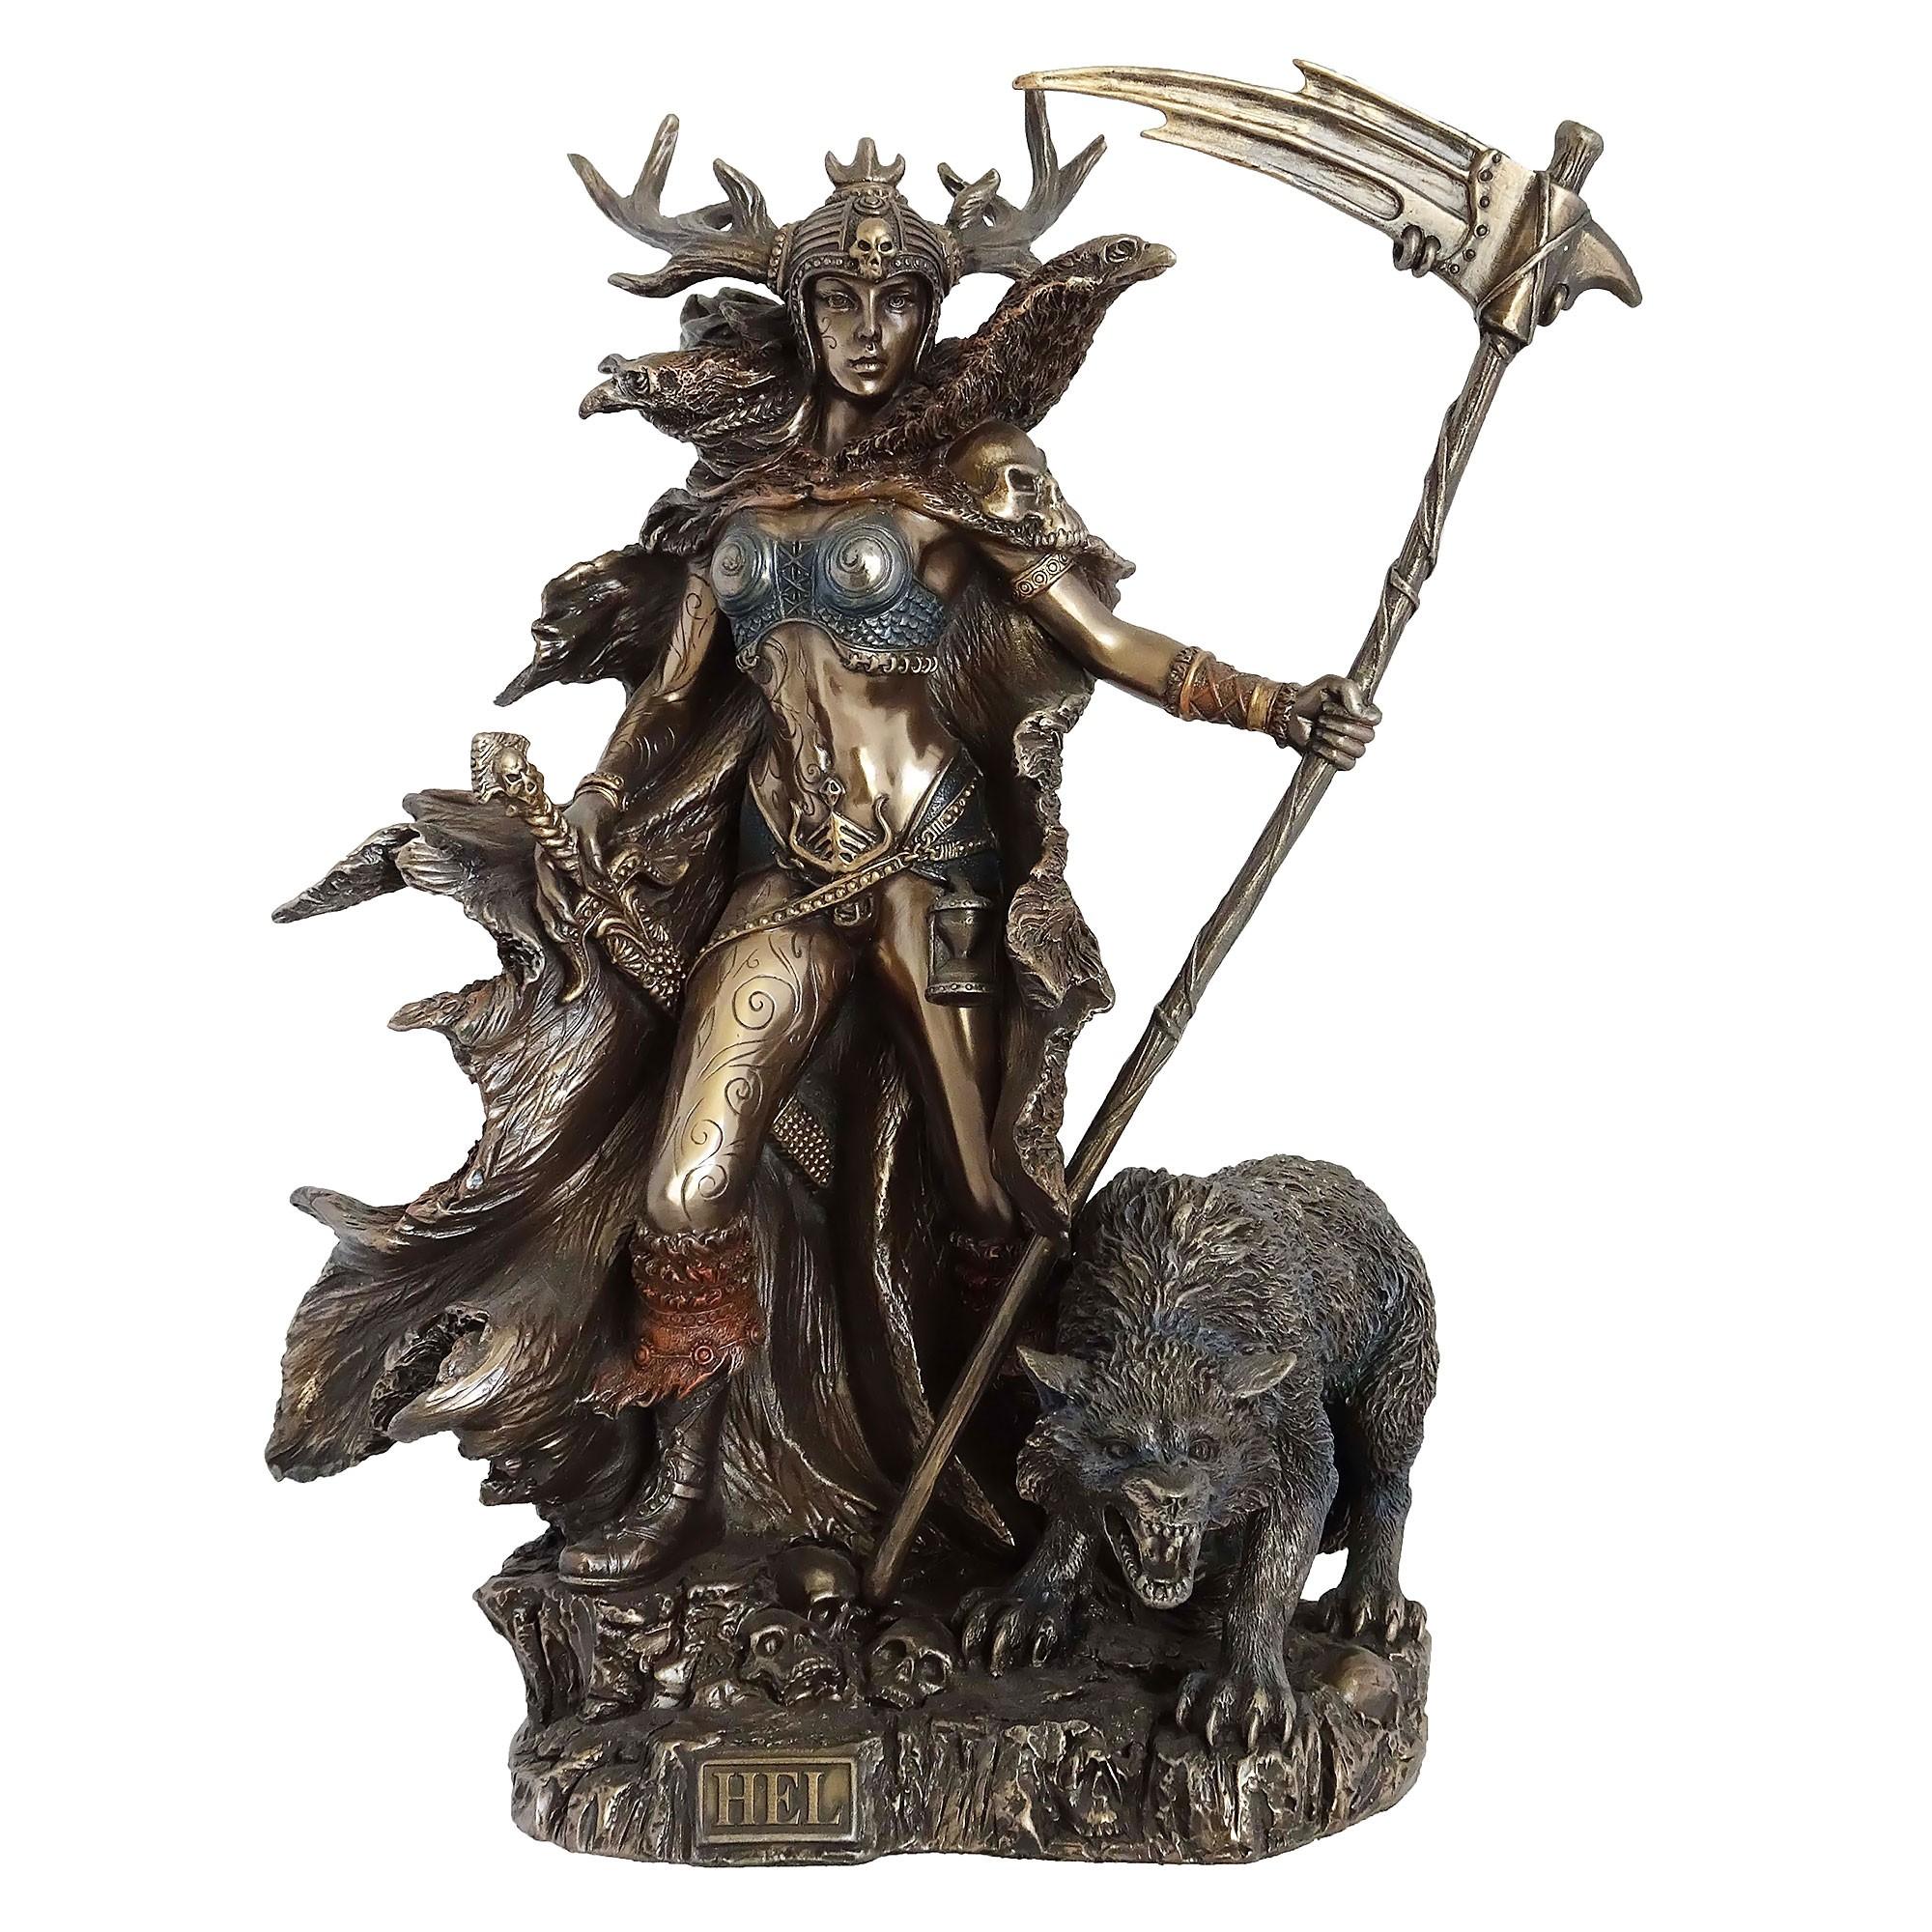 Veronese Cold Cast Bronze Coated Norse Mythology Figurine, Hel